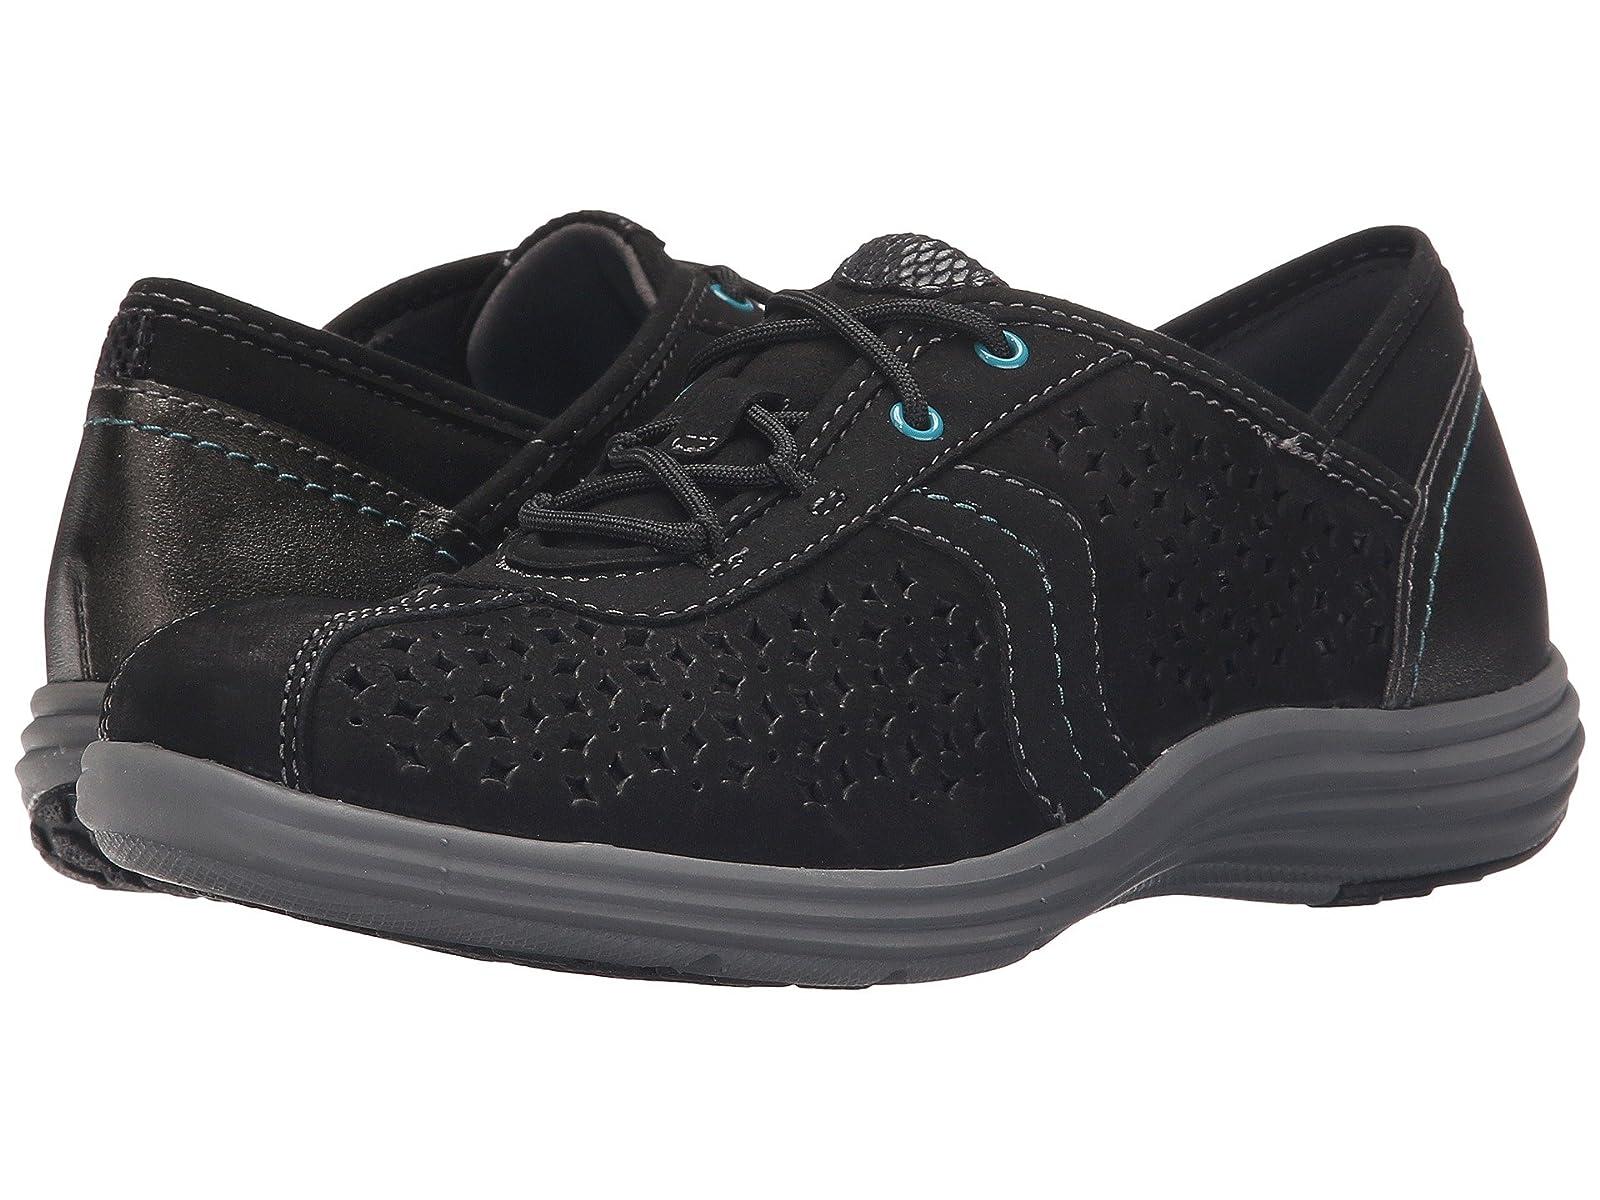 Aravon Betty-ARCheap and distinctive eye-catching shoes